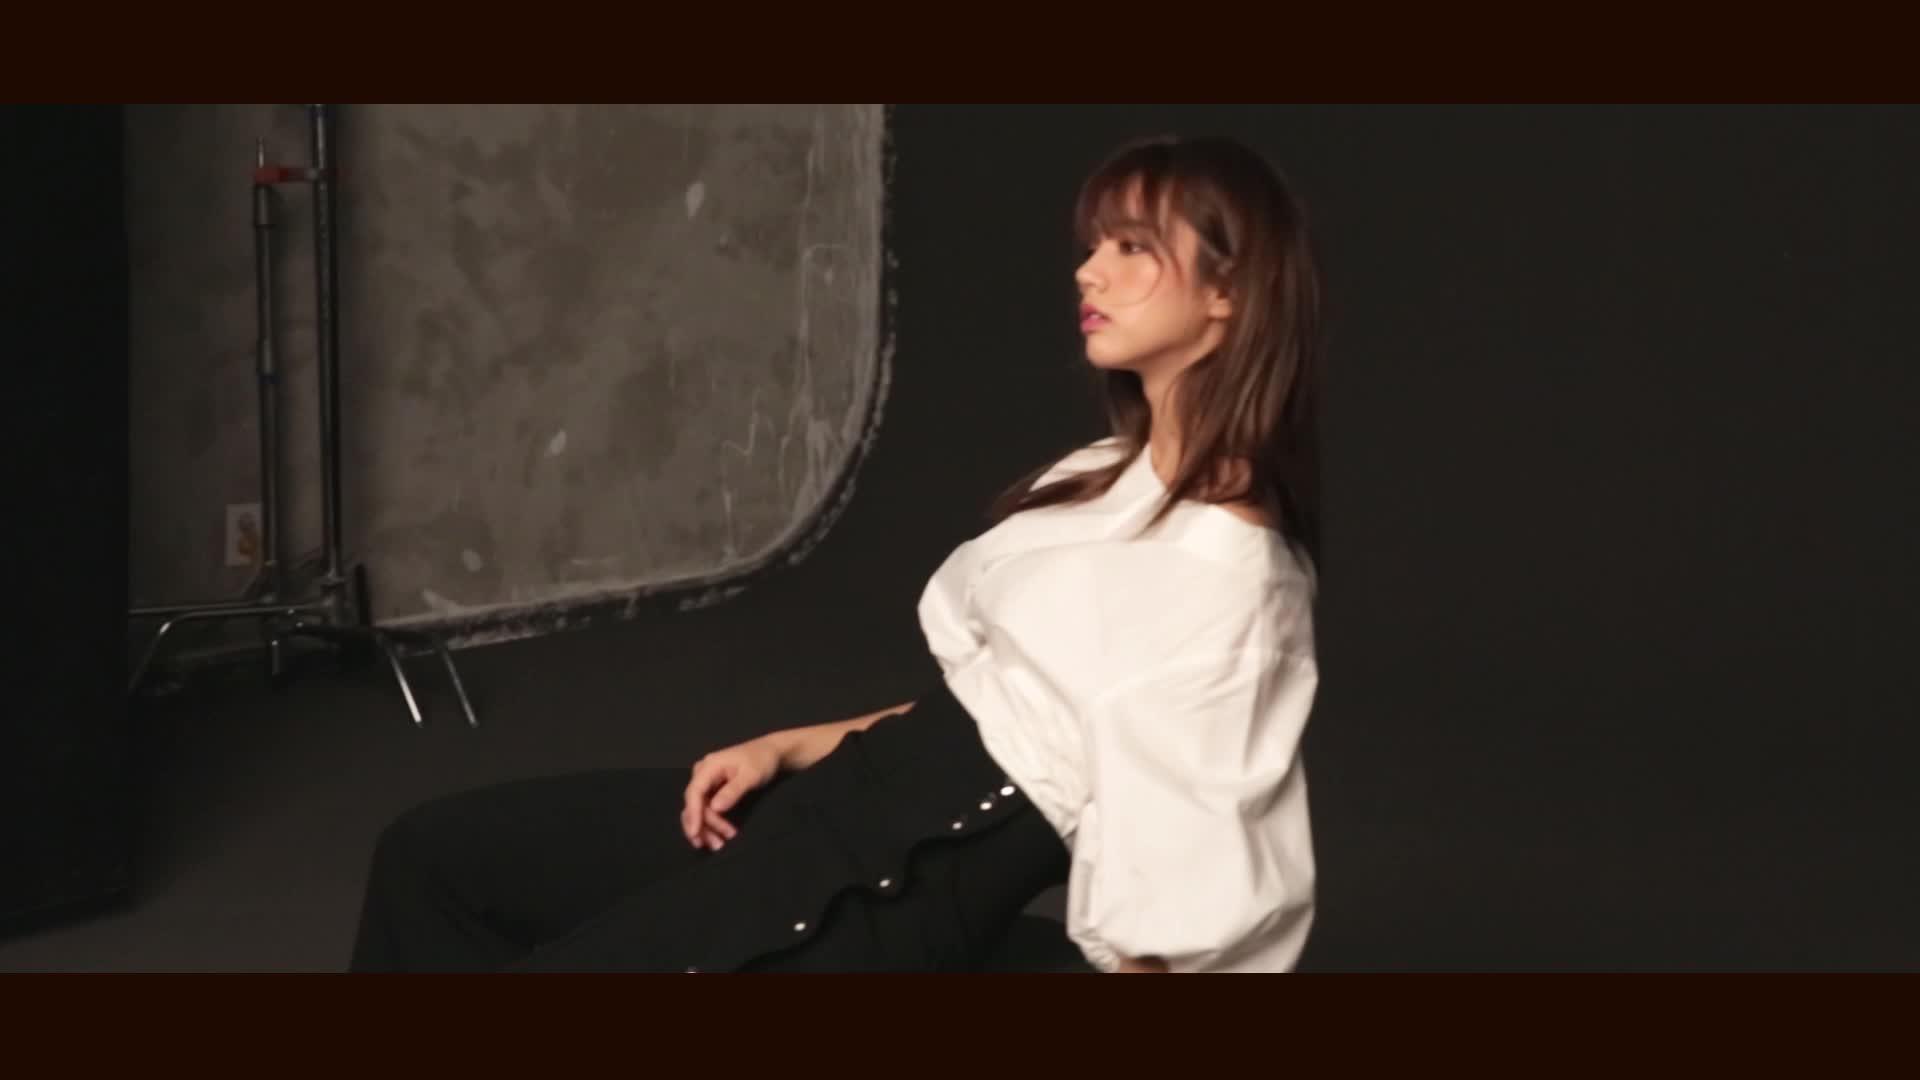 [T-CUT] HYERI Photoshoot Behind